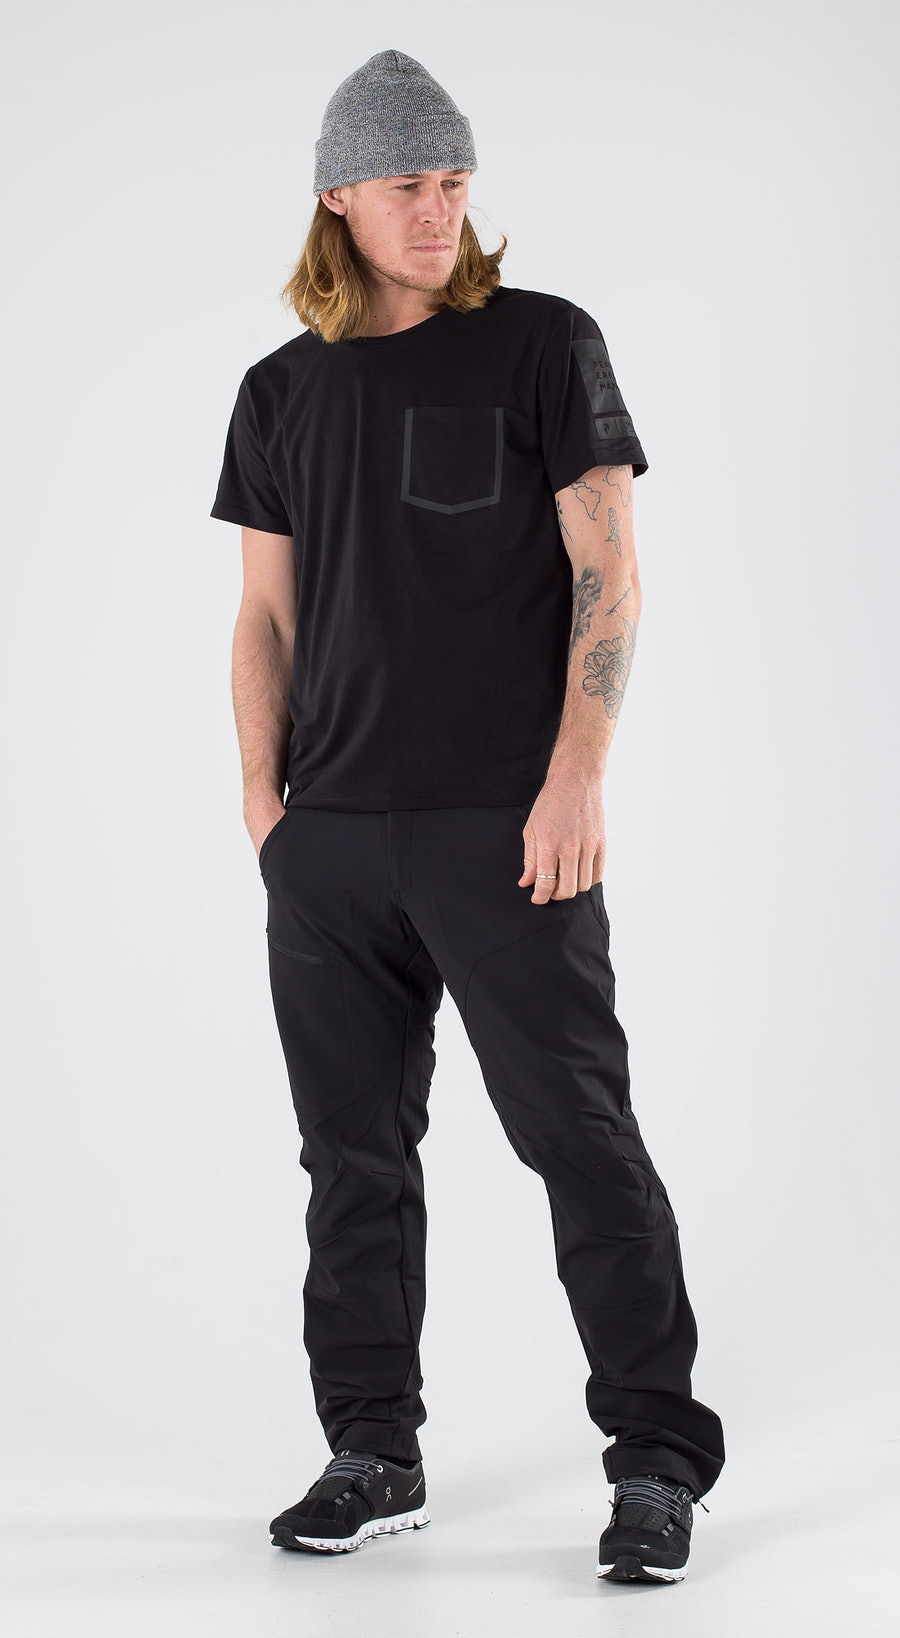 Peak Performance 2 0 Tech Tee Black Outfit Multi